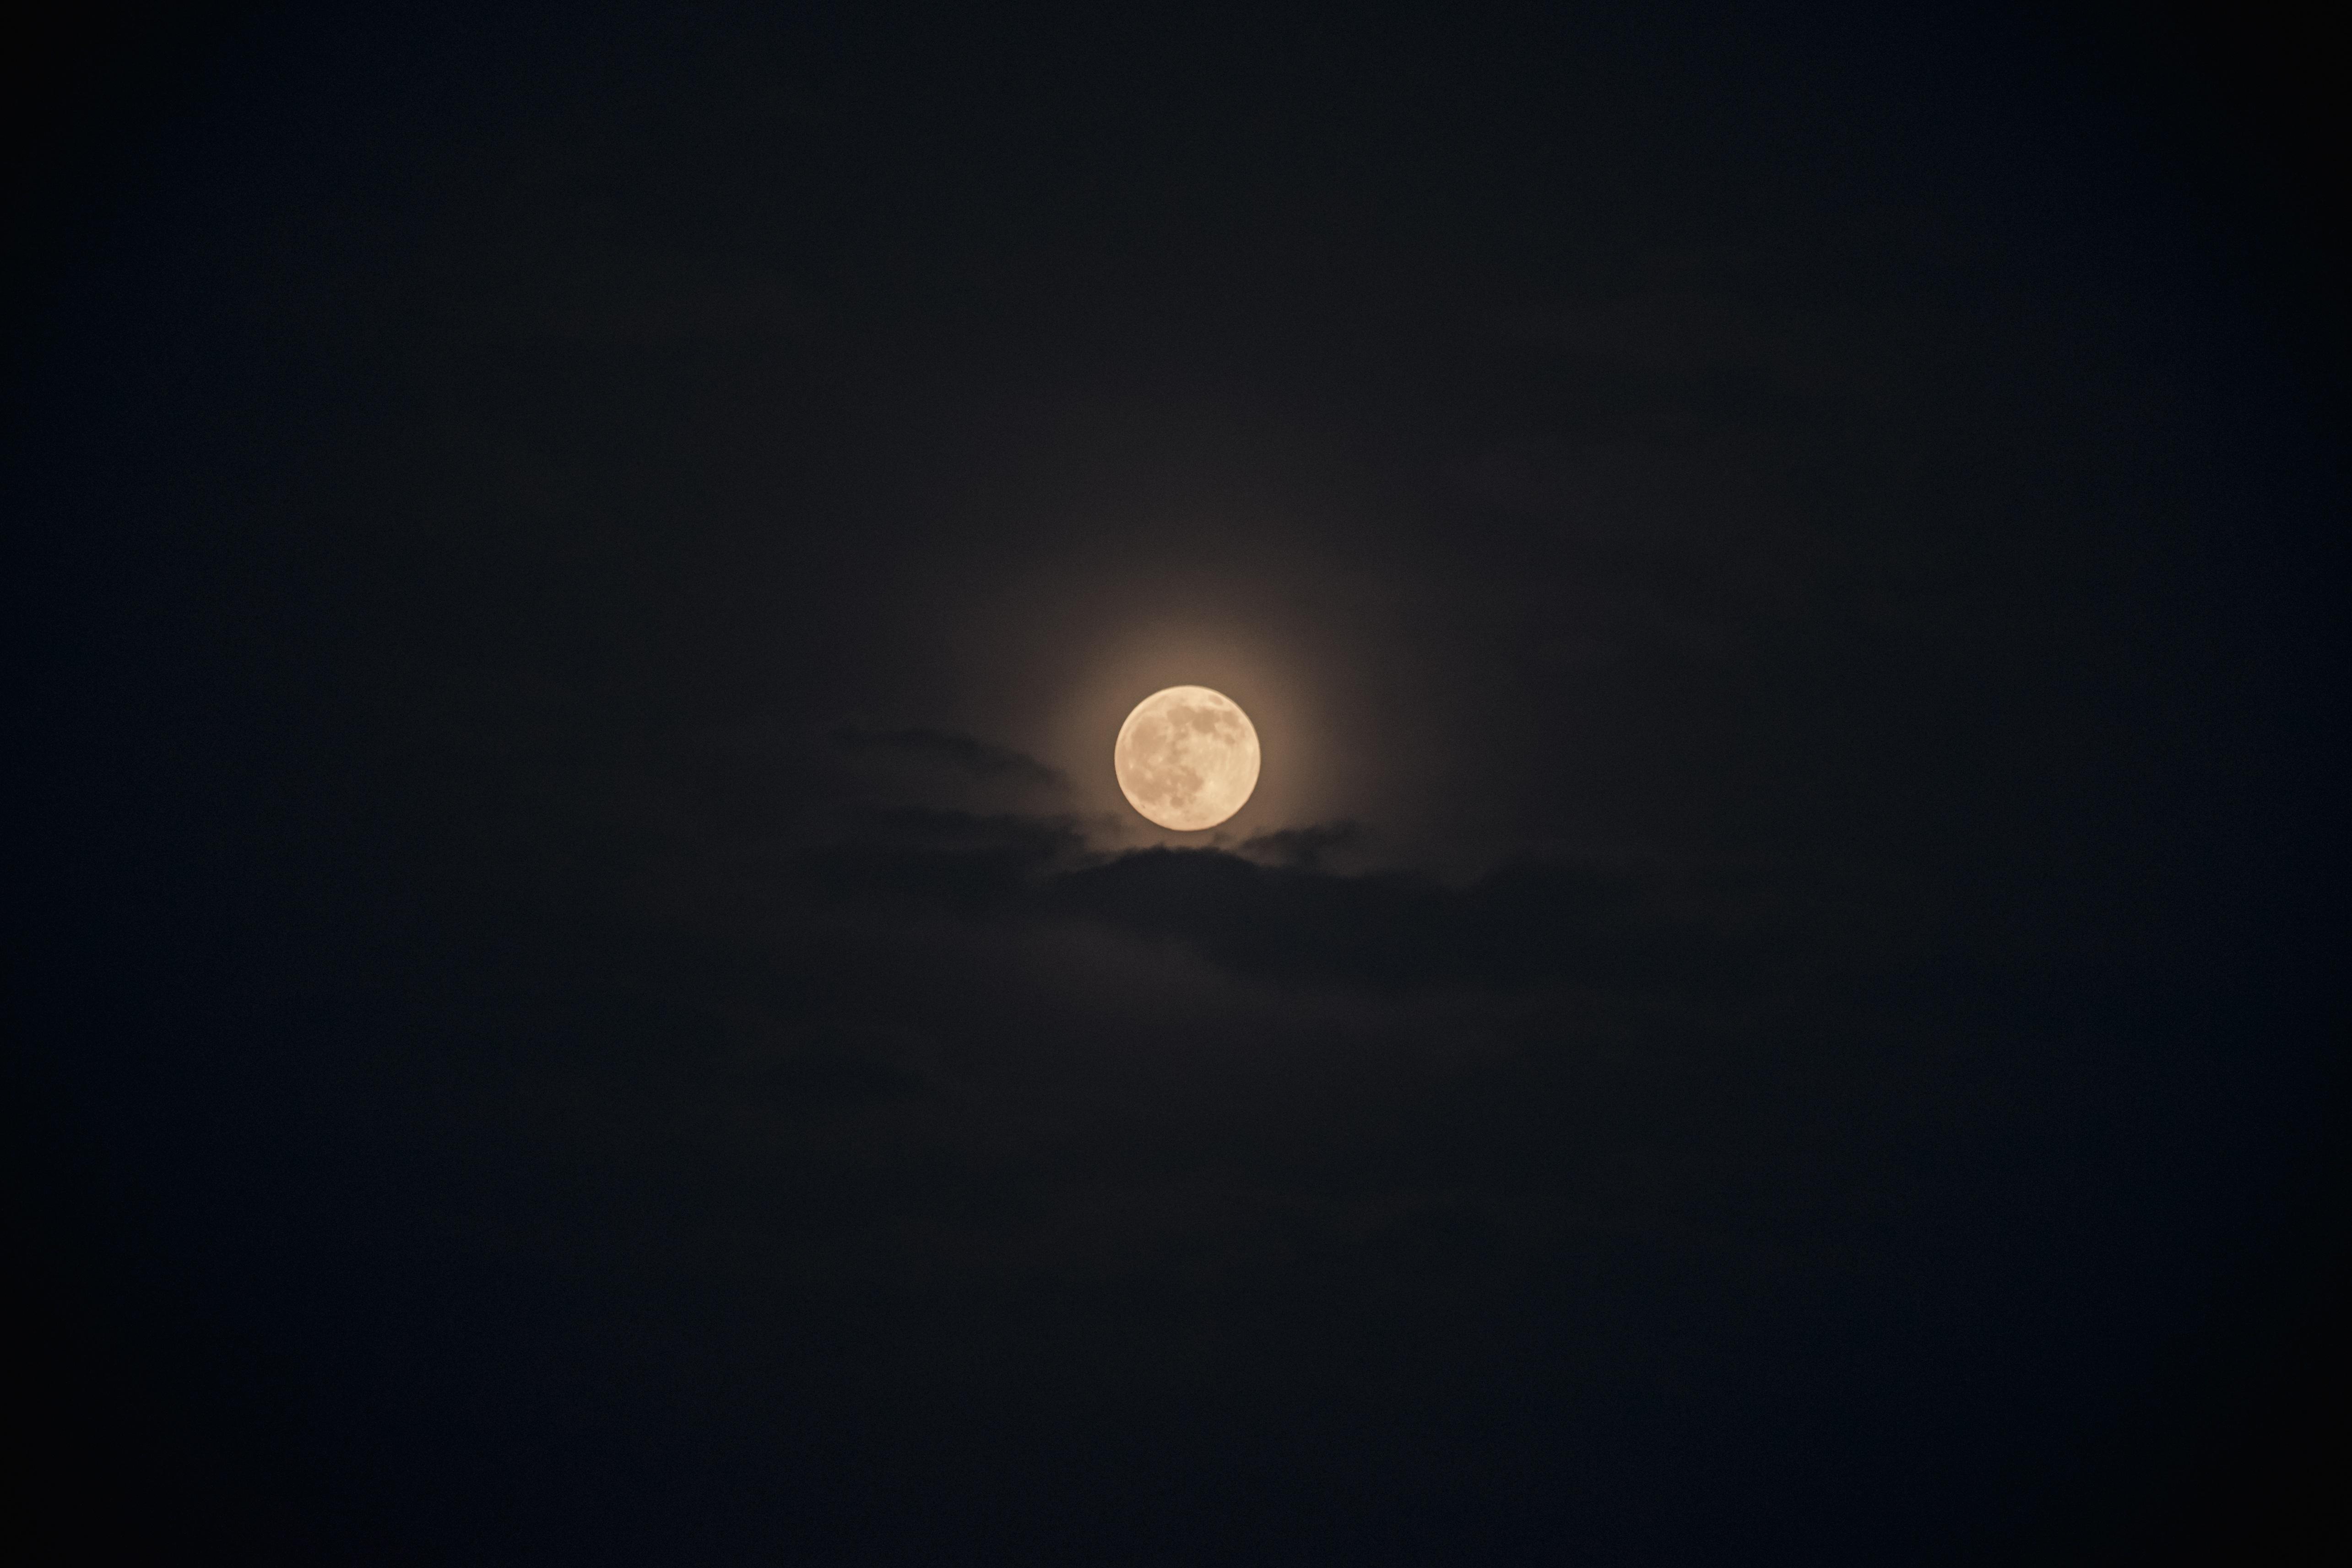 Gambar cahaya awan langit putih suasana gelap teleskop